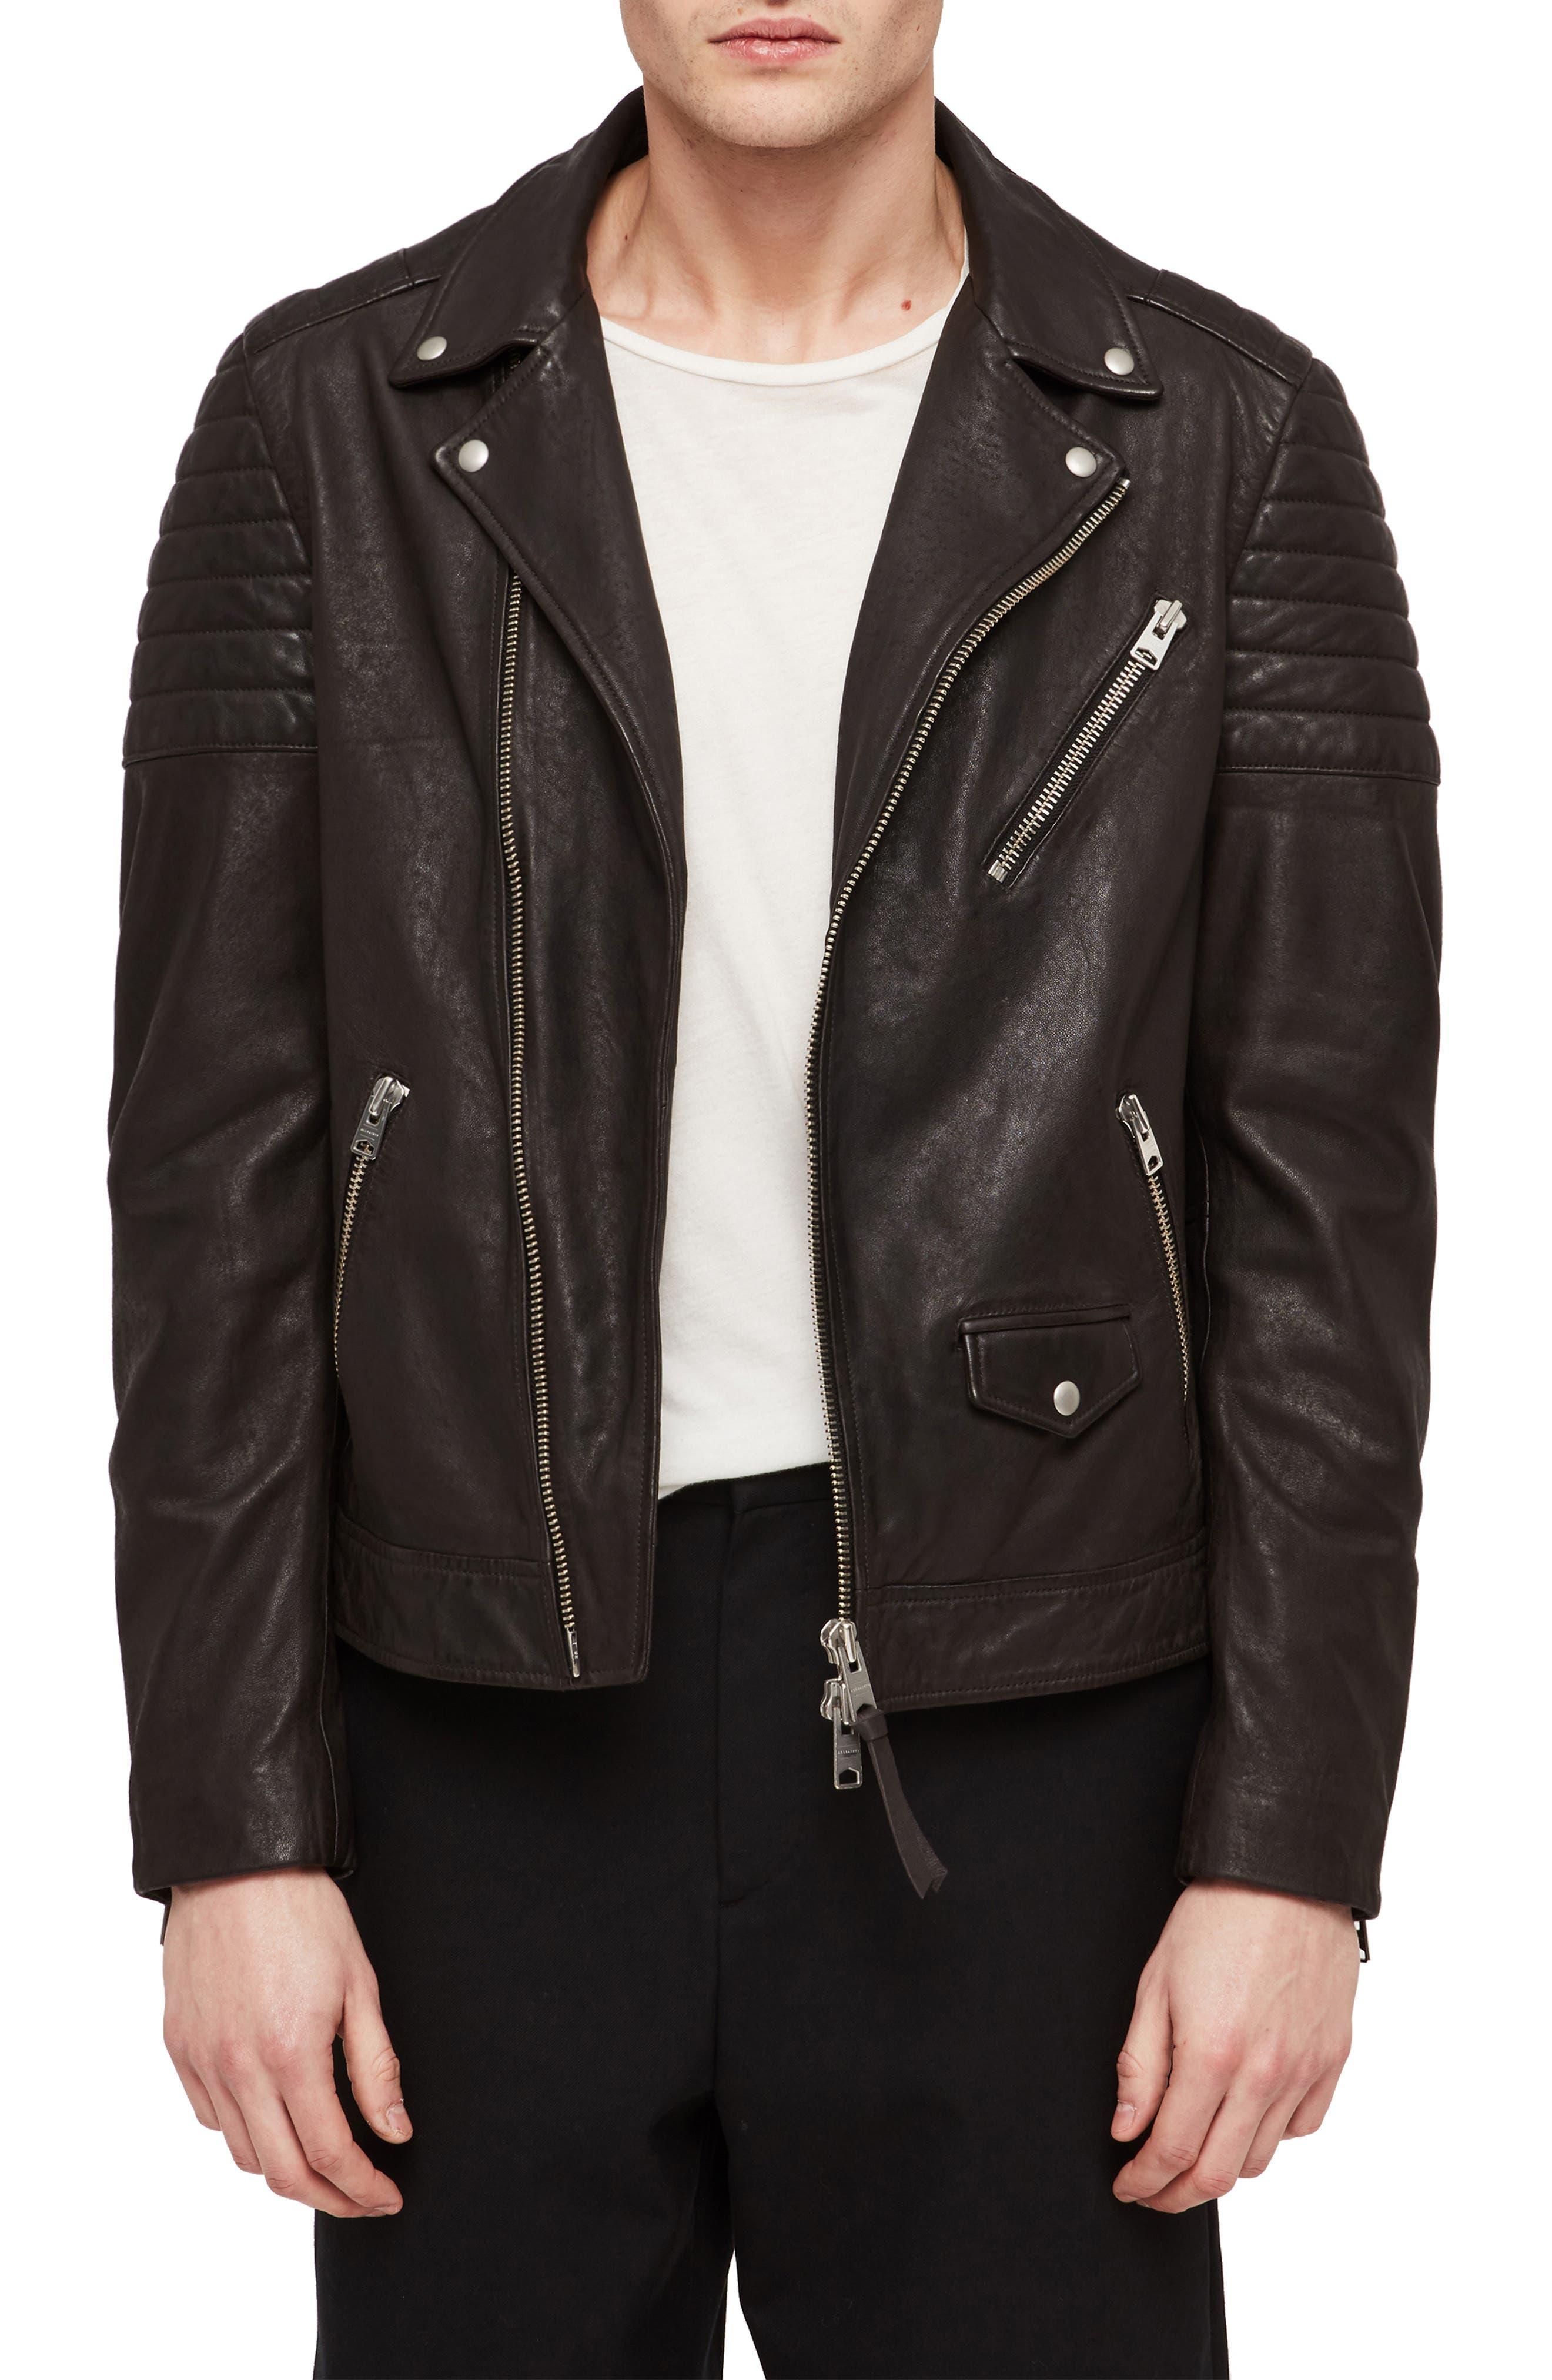 b3635f314 Buy allsaints coats & jackets for men - Best men's allsaints coats ...